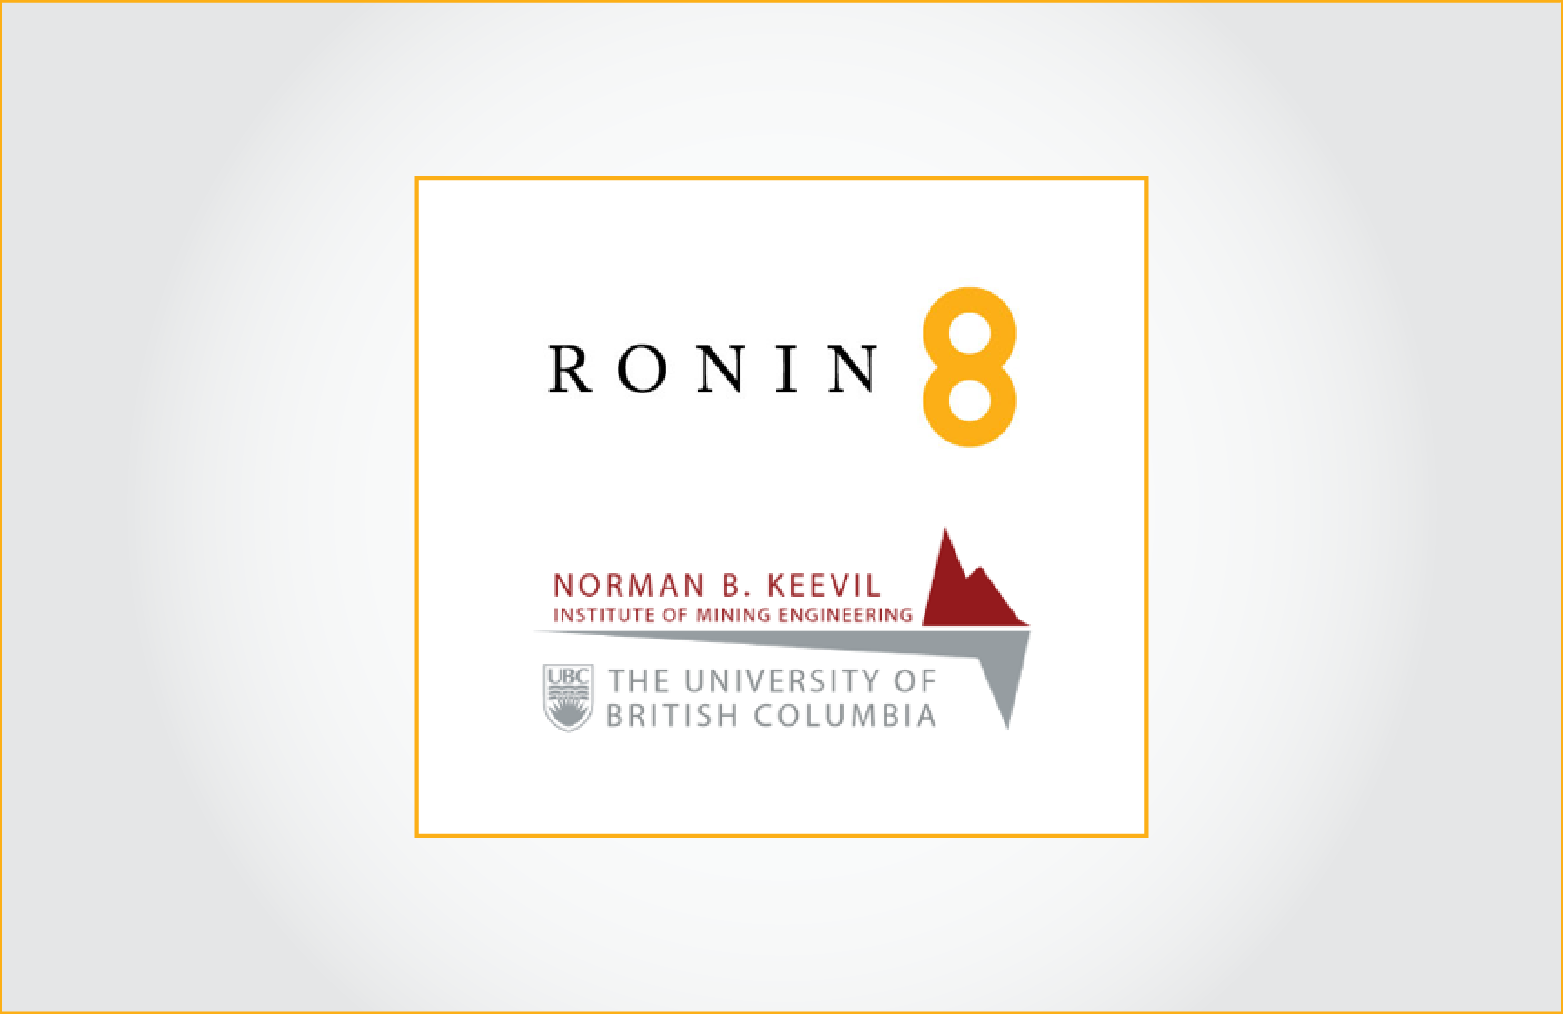 Ronin8 UBC